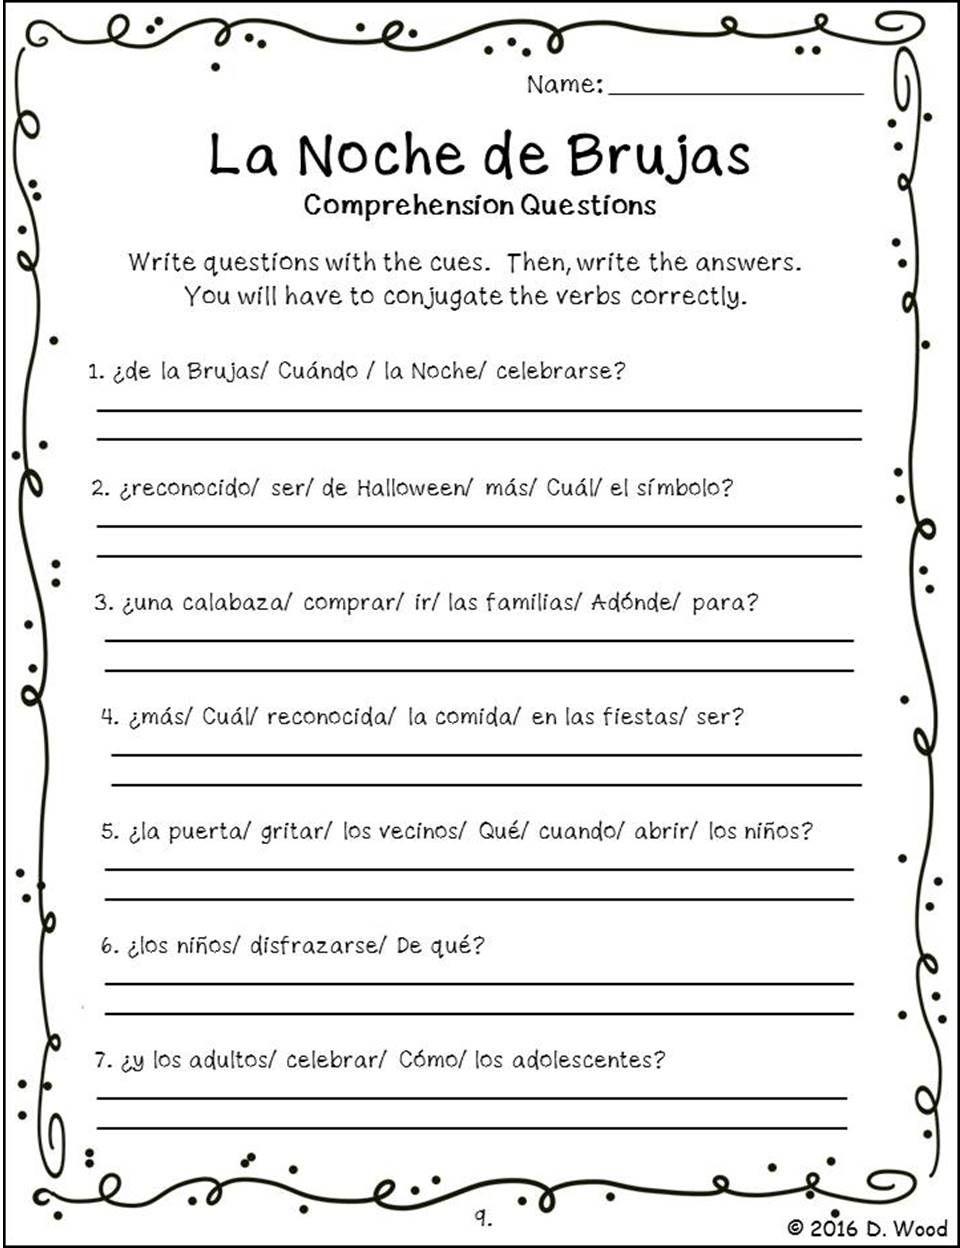 Bilingual Spanish English Reading On The Celebration Of Halloween It Spanish Reading Comprehension Reading Comprehension Worksheets Spanish Lessons For Kids